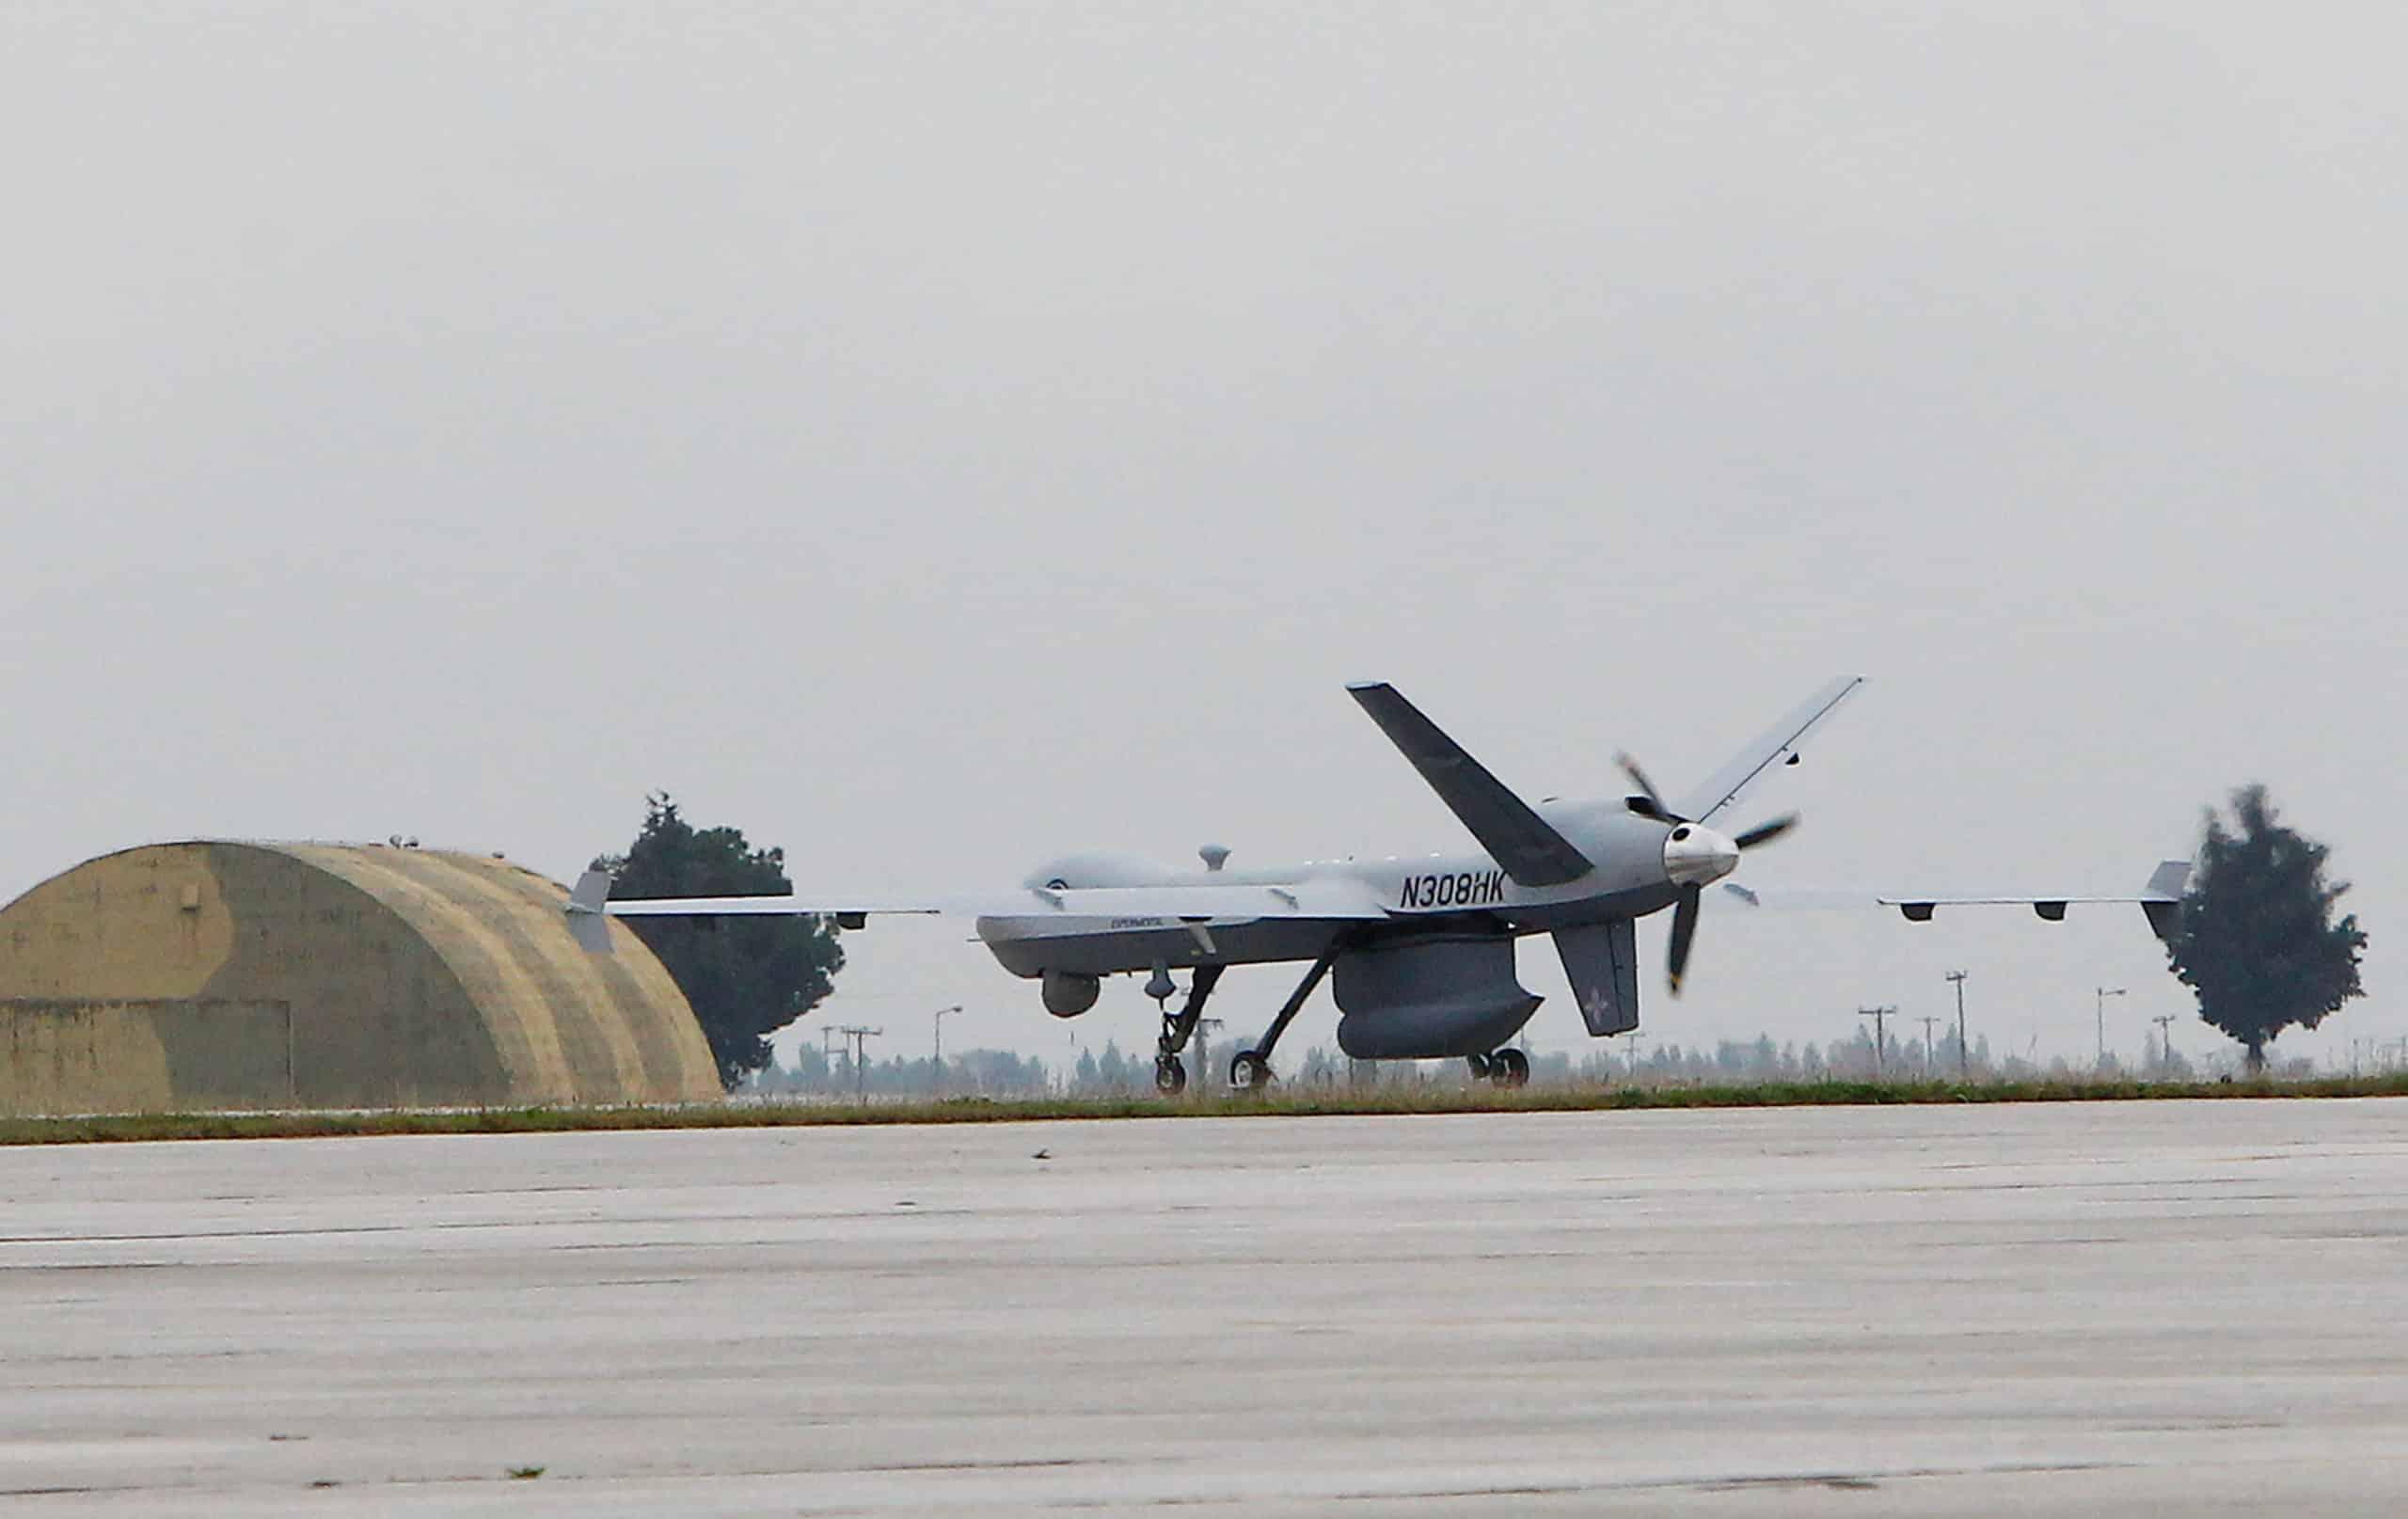 MQ-9 Guardian: Αυτό είναι το ελληνικό Drone «ΟΣ Τα Πανθ' Ορά» VIDEO